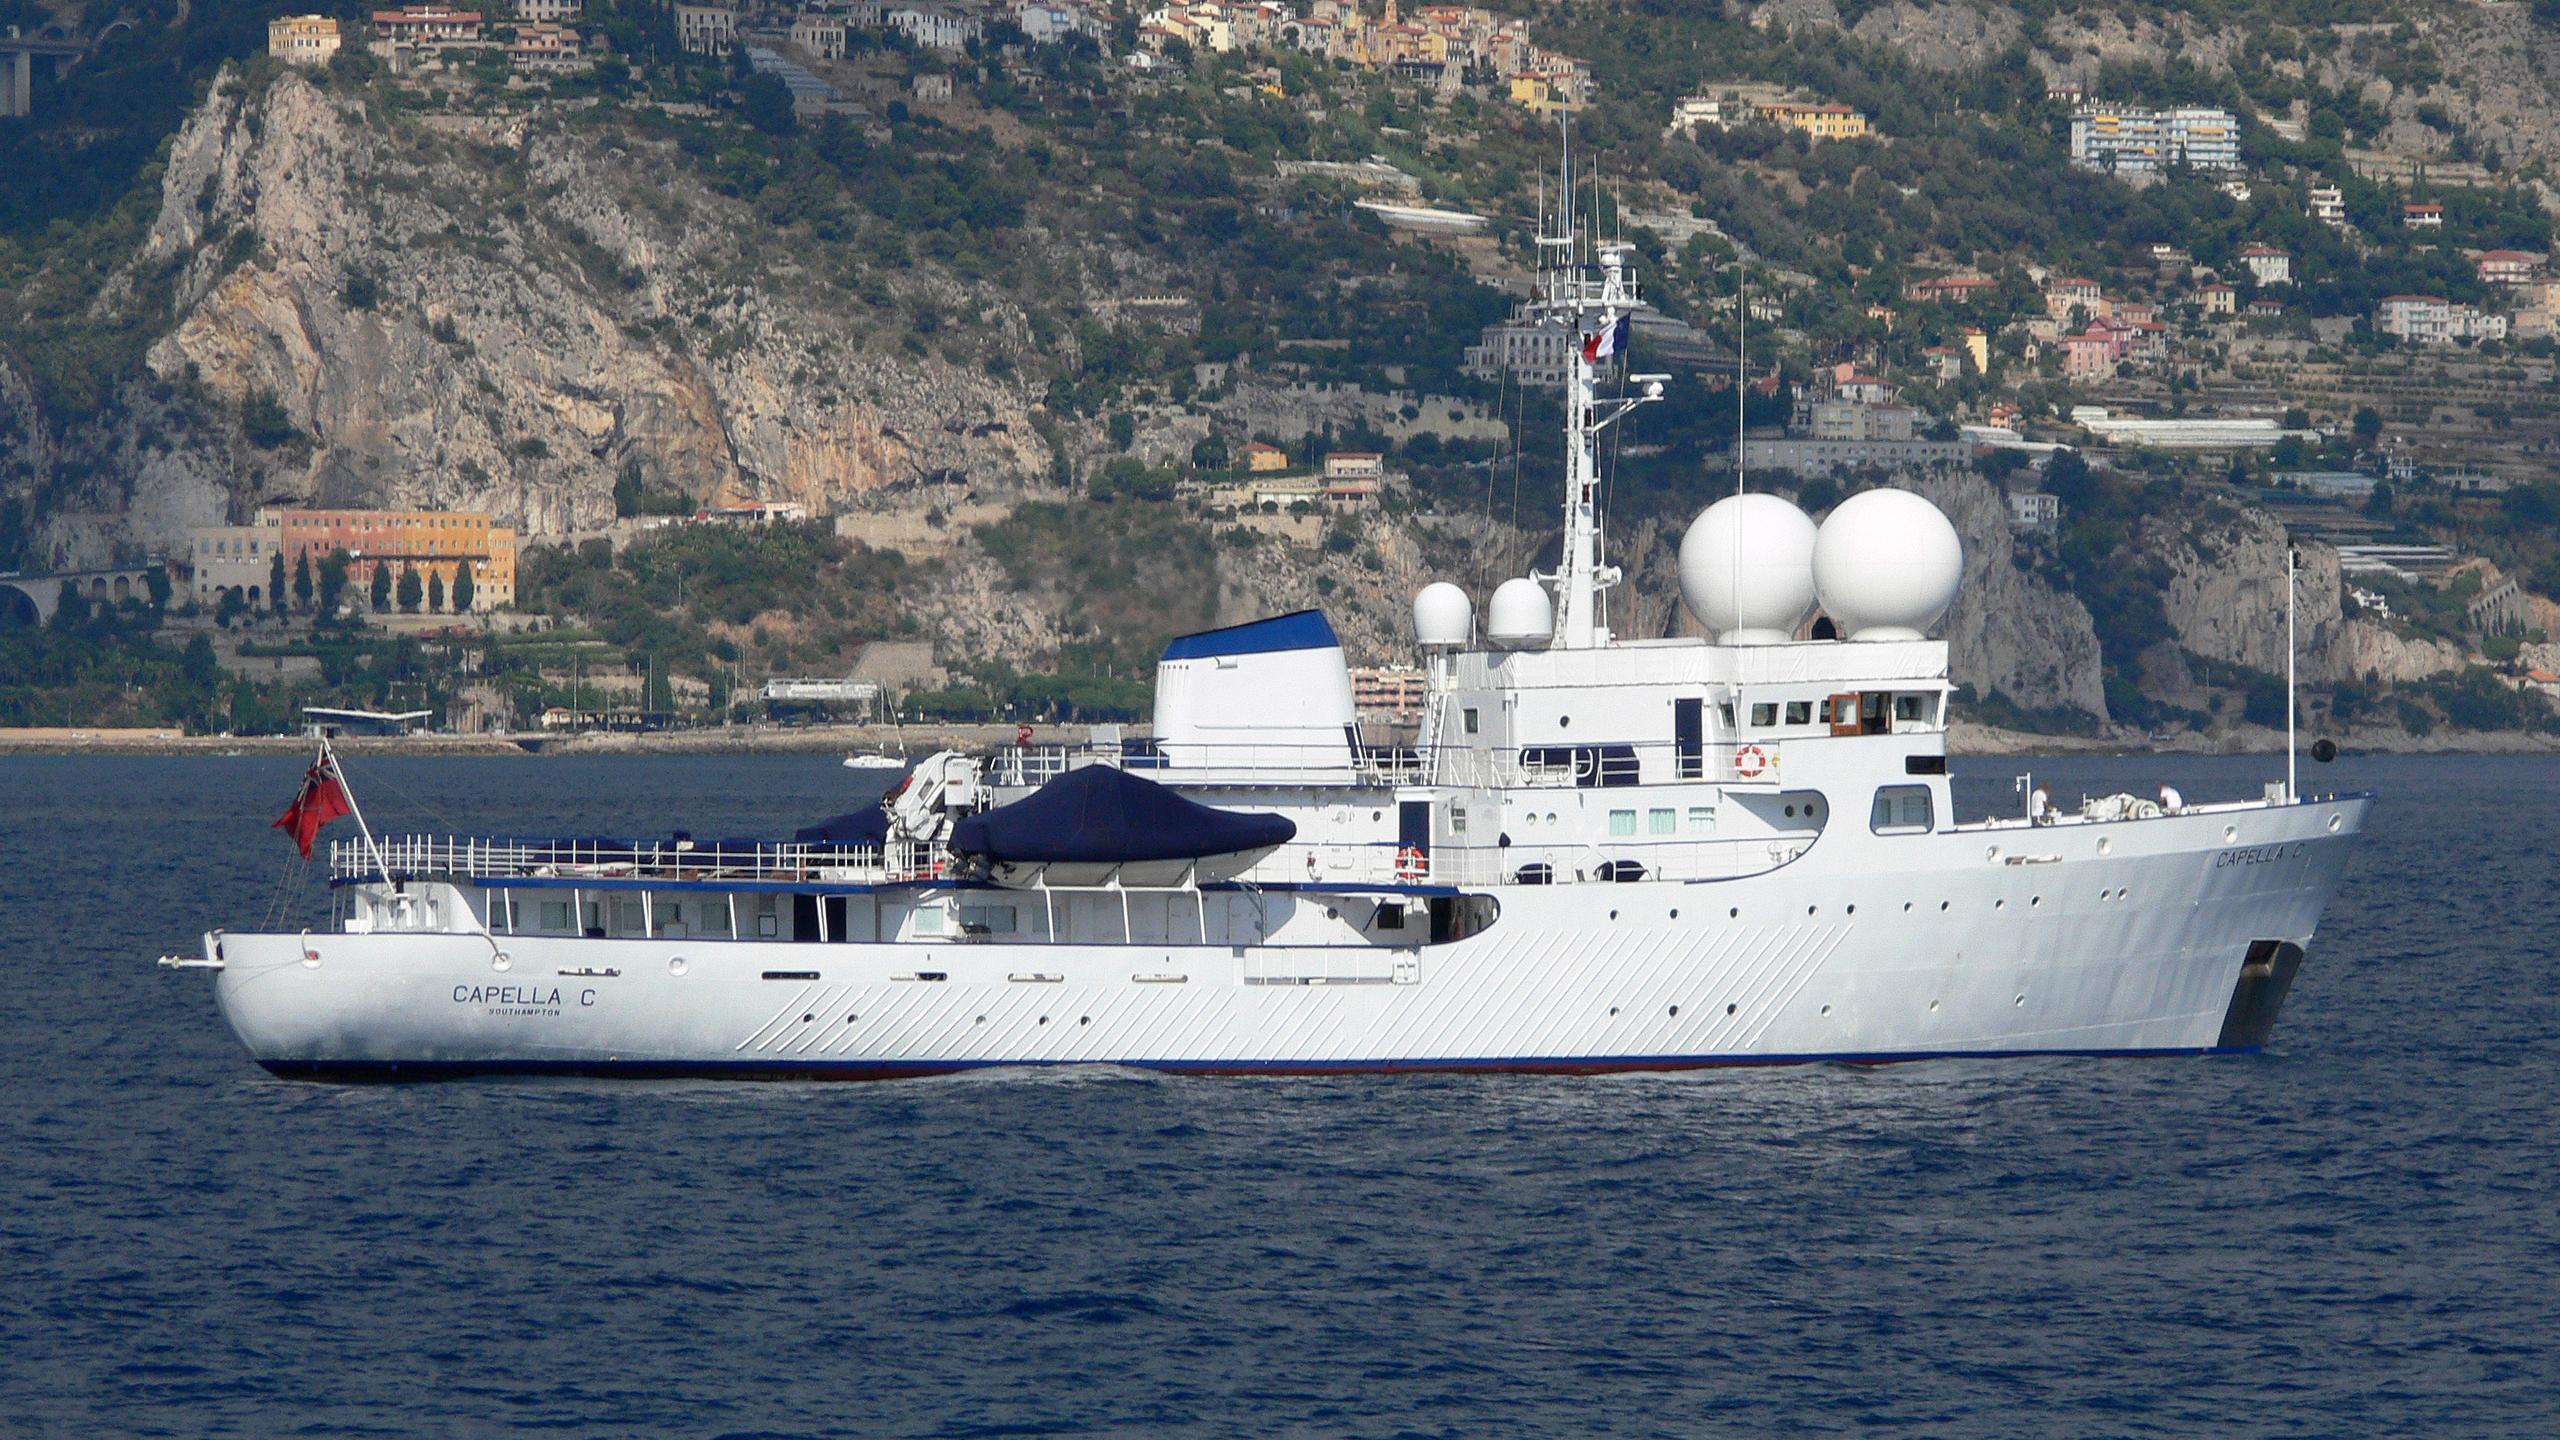 capella-c-explorer-yacht-scheepsbouwwerf-gebroeders-pot-1969-59m-profile